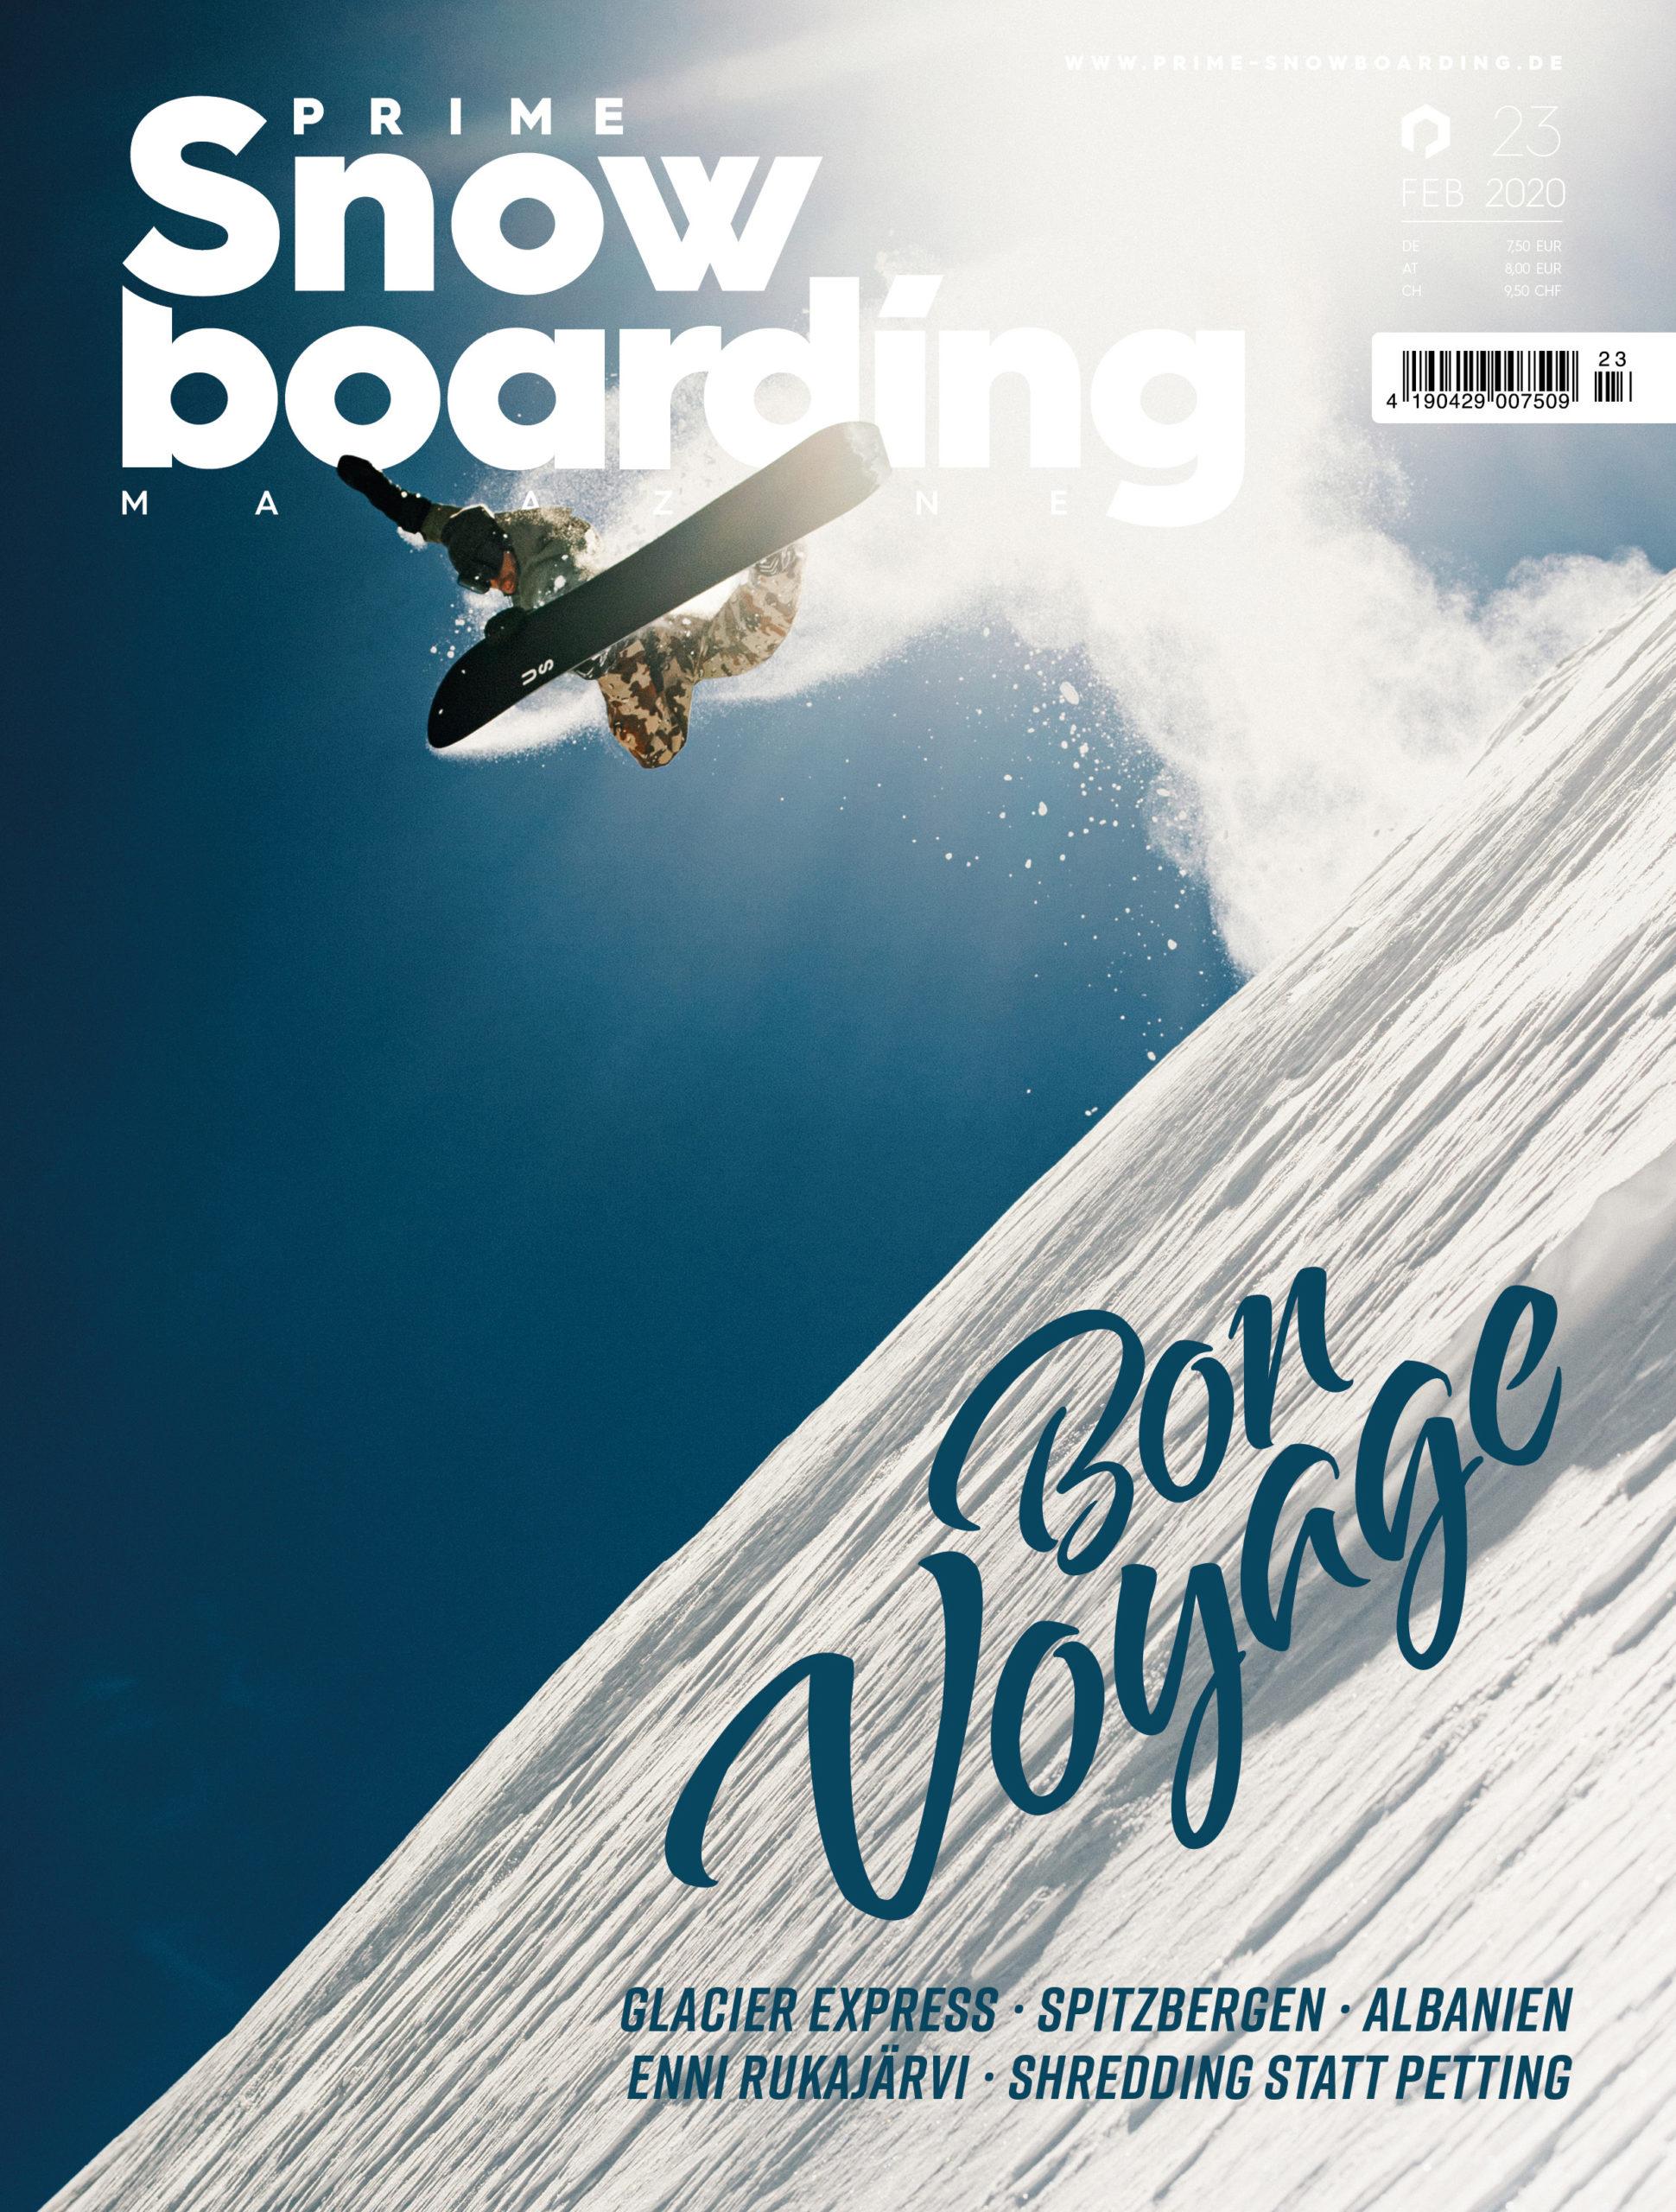 PRIME SNOWBOARDING MAGAZINE #23